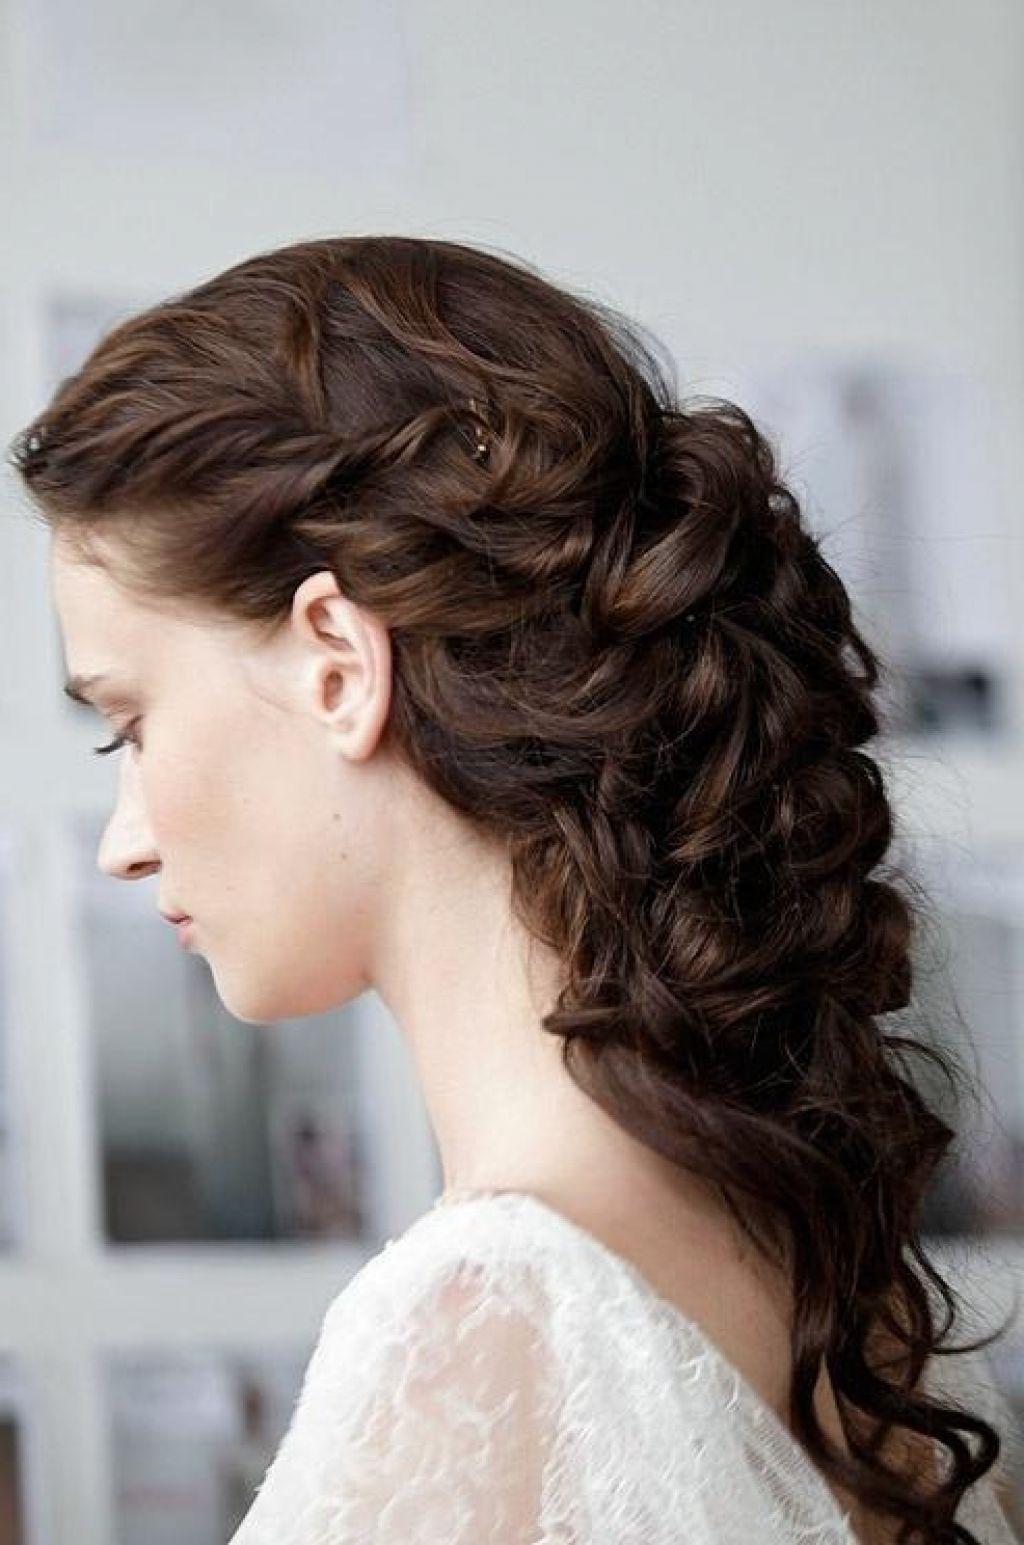 wedding hairstyles half up half down - google search | wedding